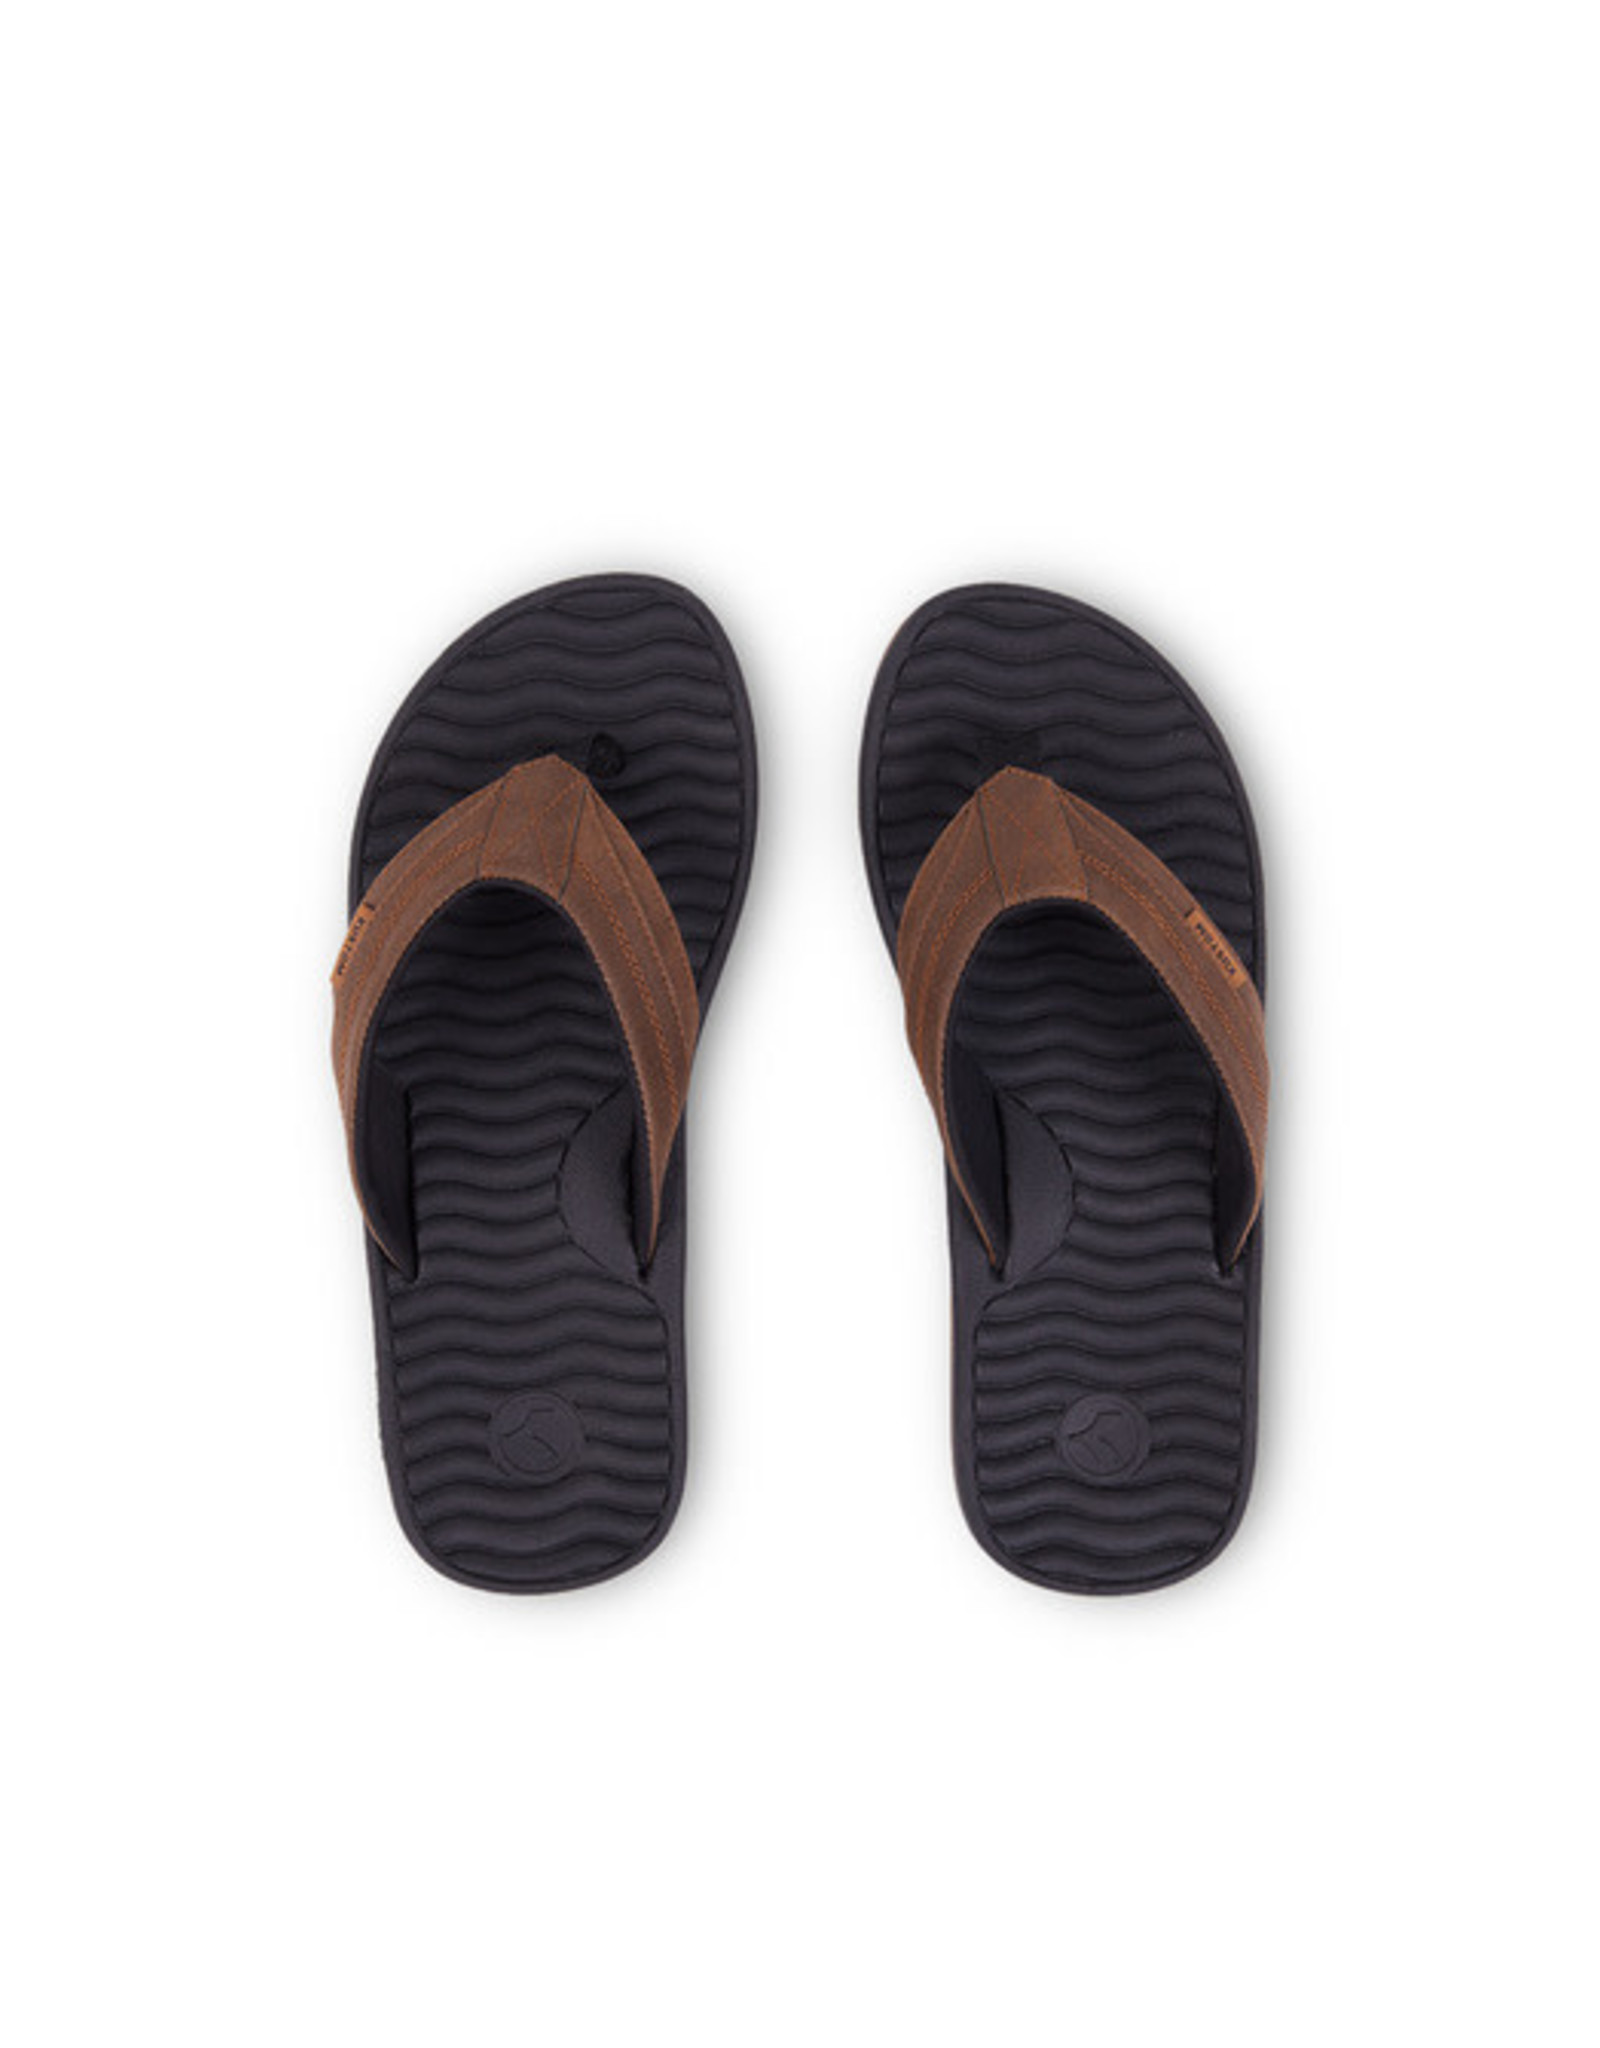 KUSTOM Quest Sandal